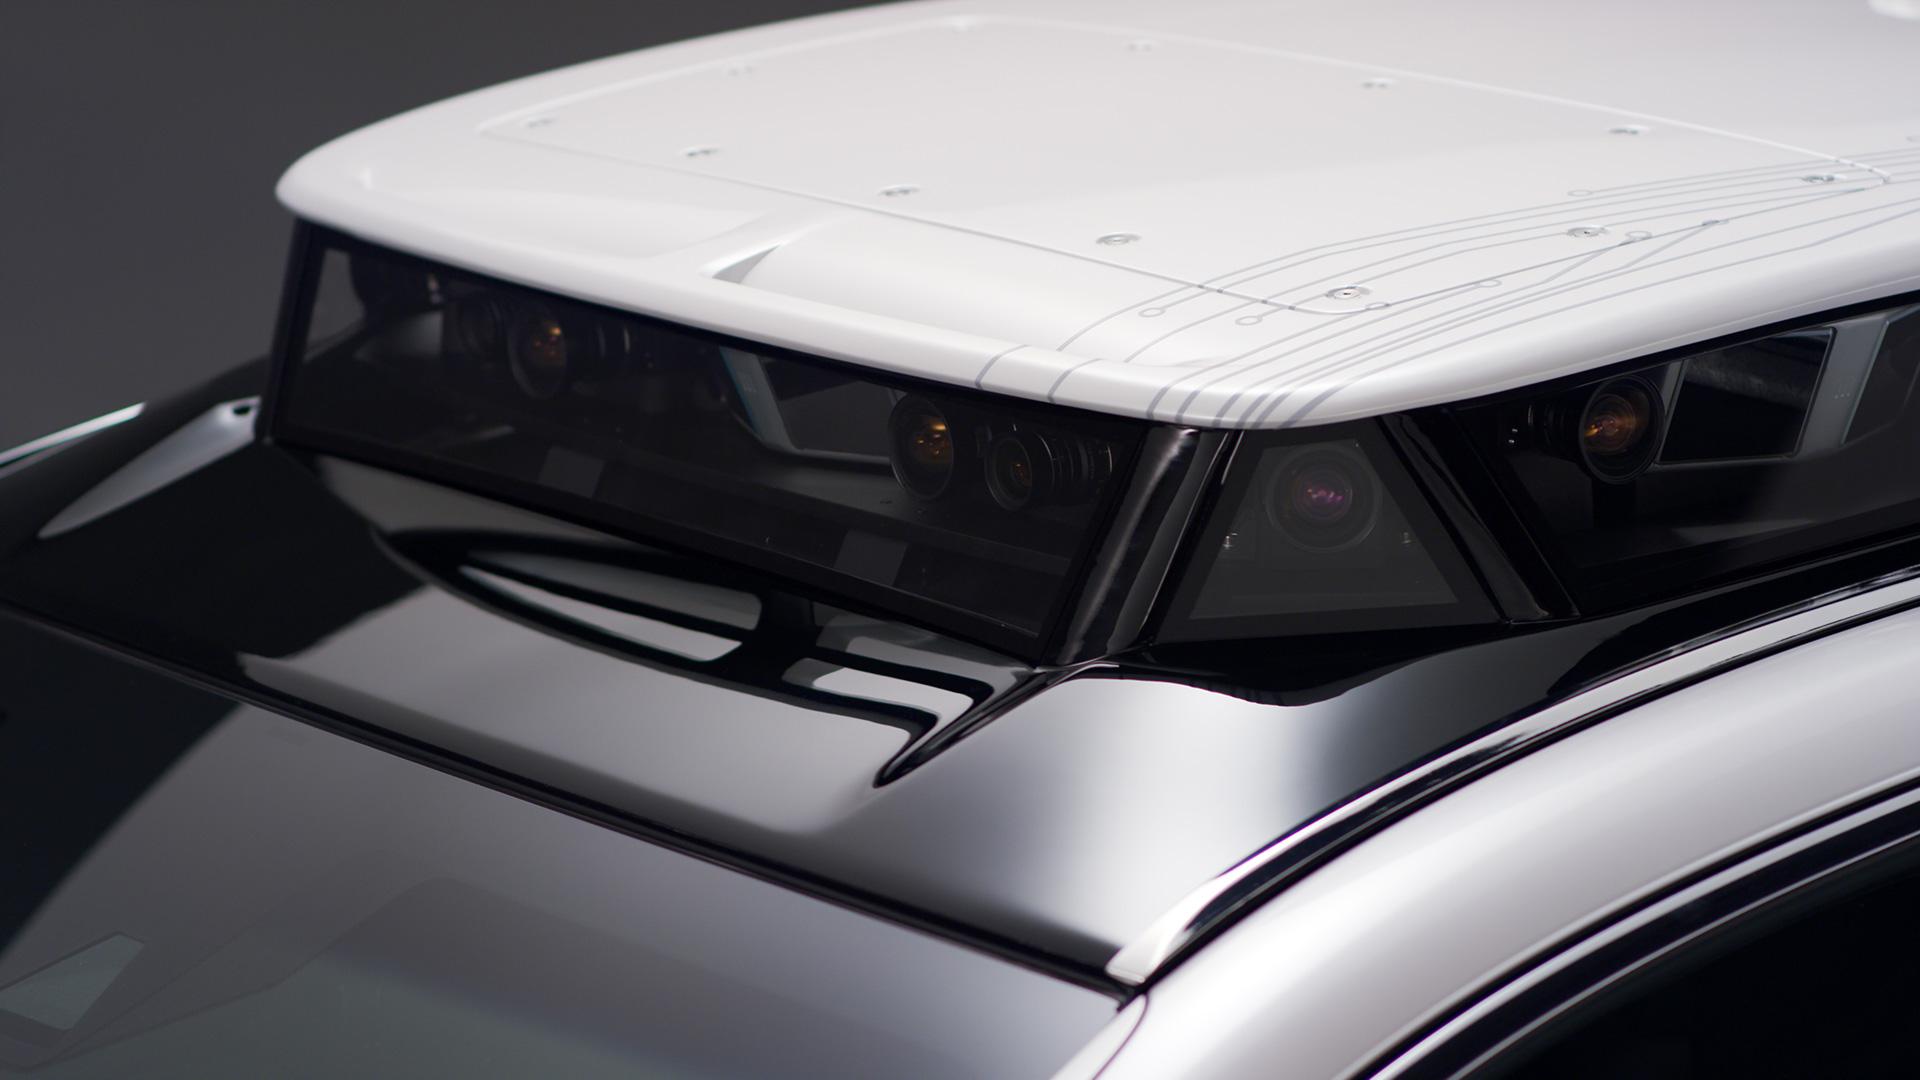 「【CES 2019】新型レクサスLSをベースとした自動運転実験車「TRI-P4」を披露」の5枚目の画像